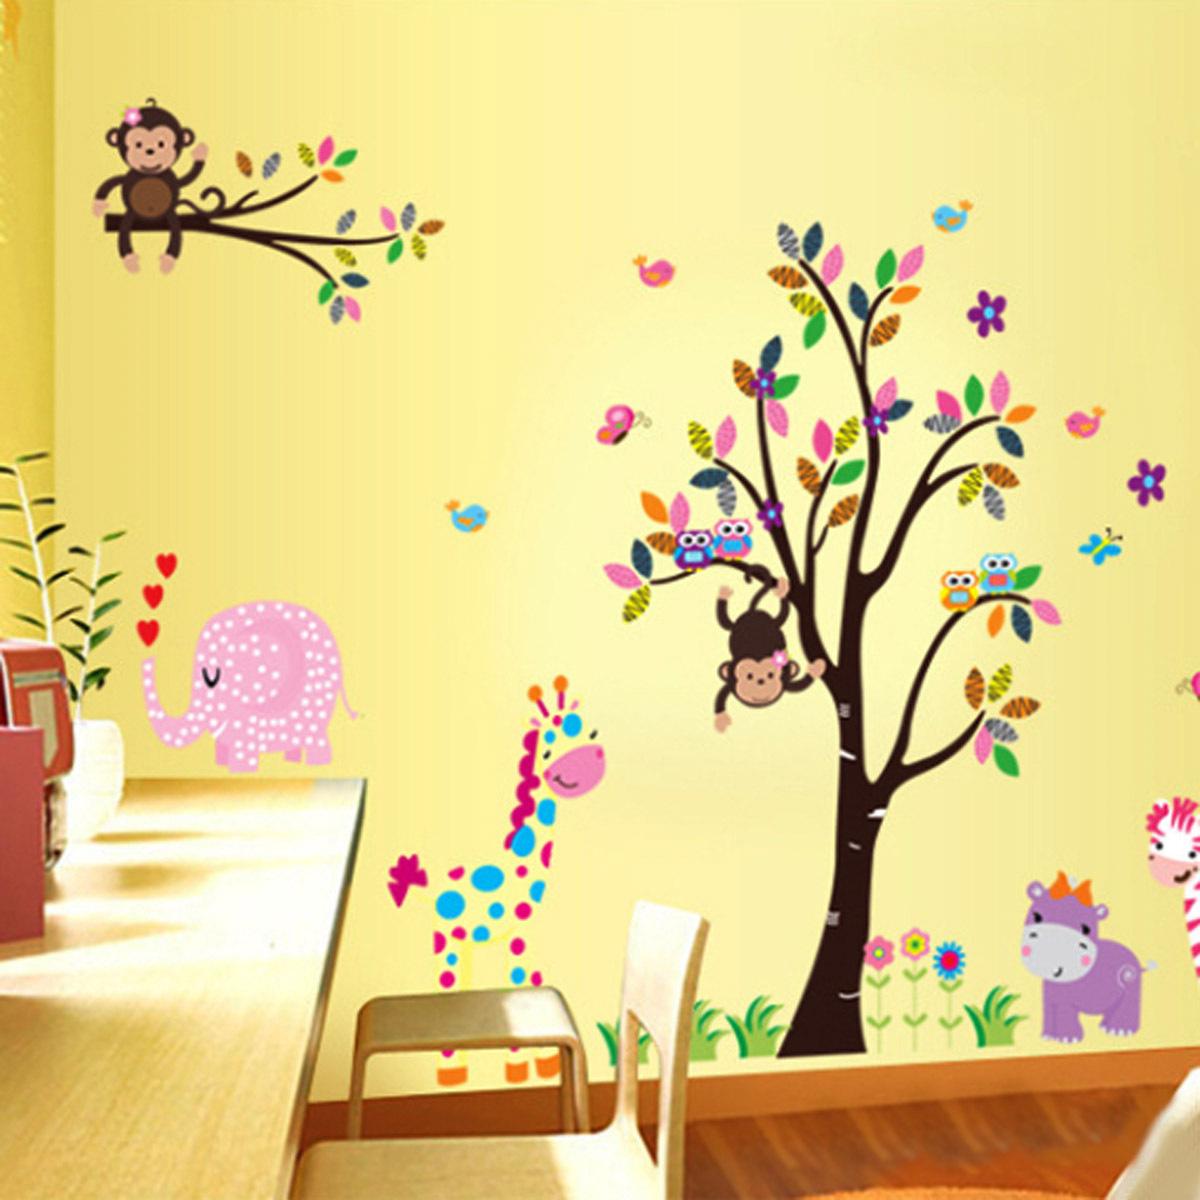 Cute cartoon wall sticker animals zoo removable nursery for Cute wall decor